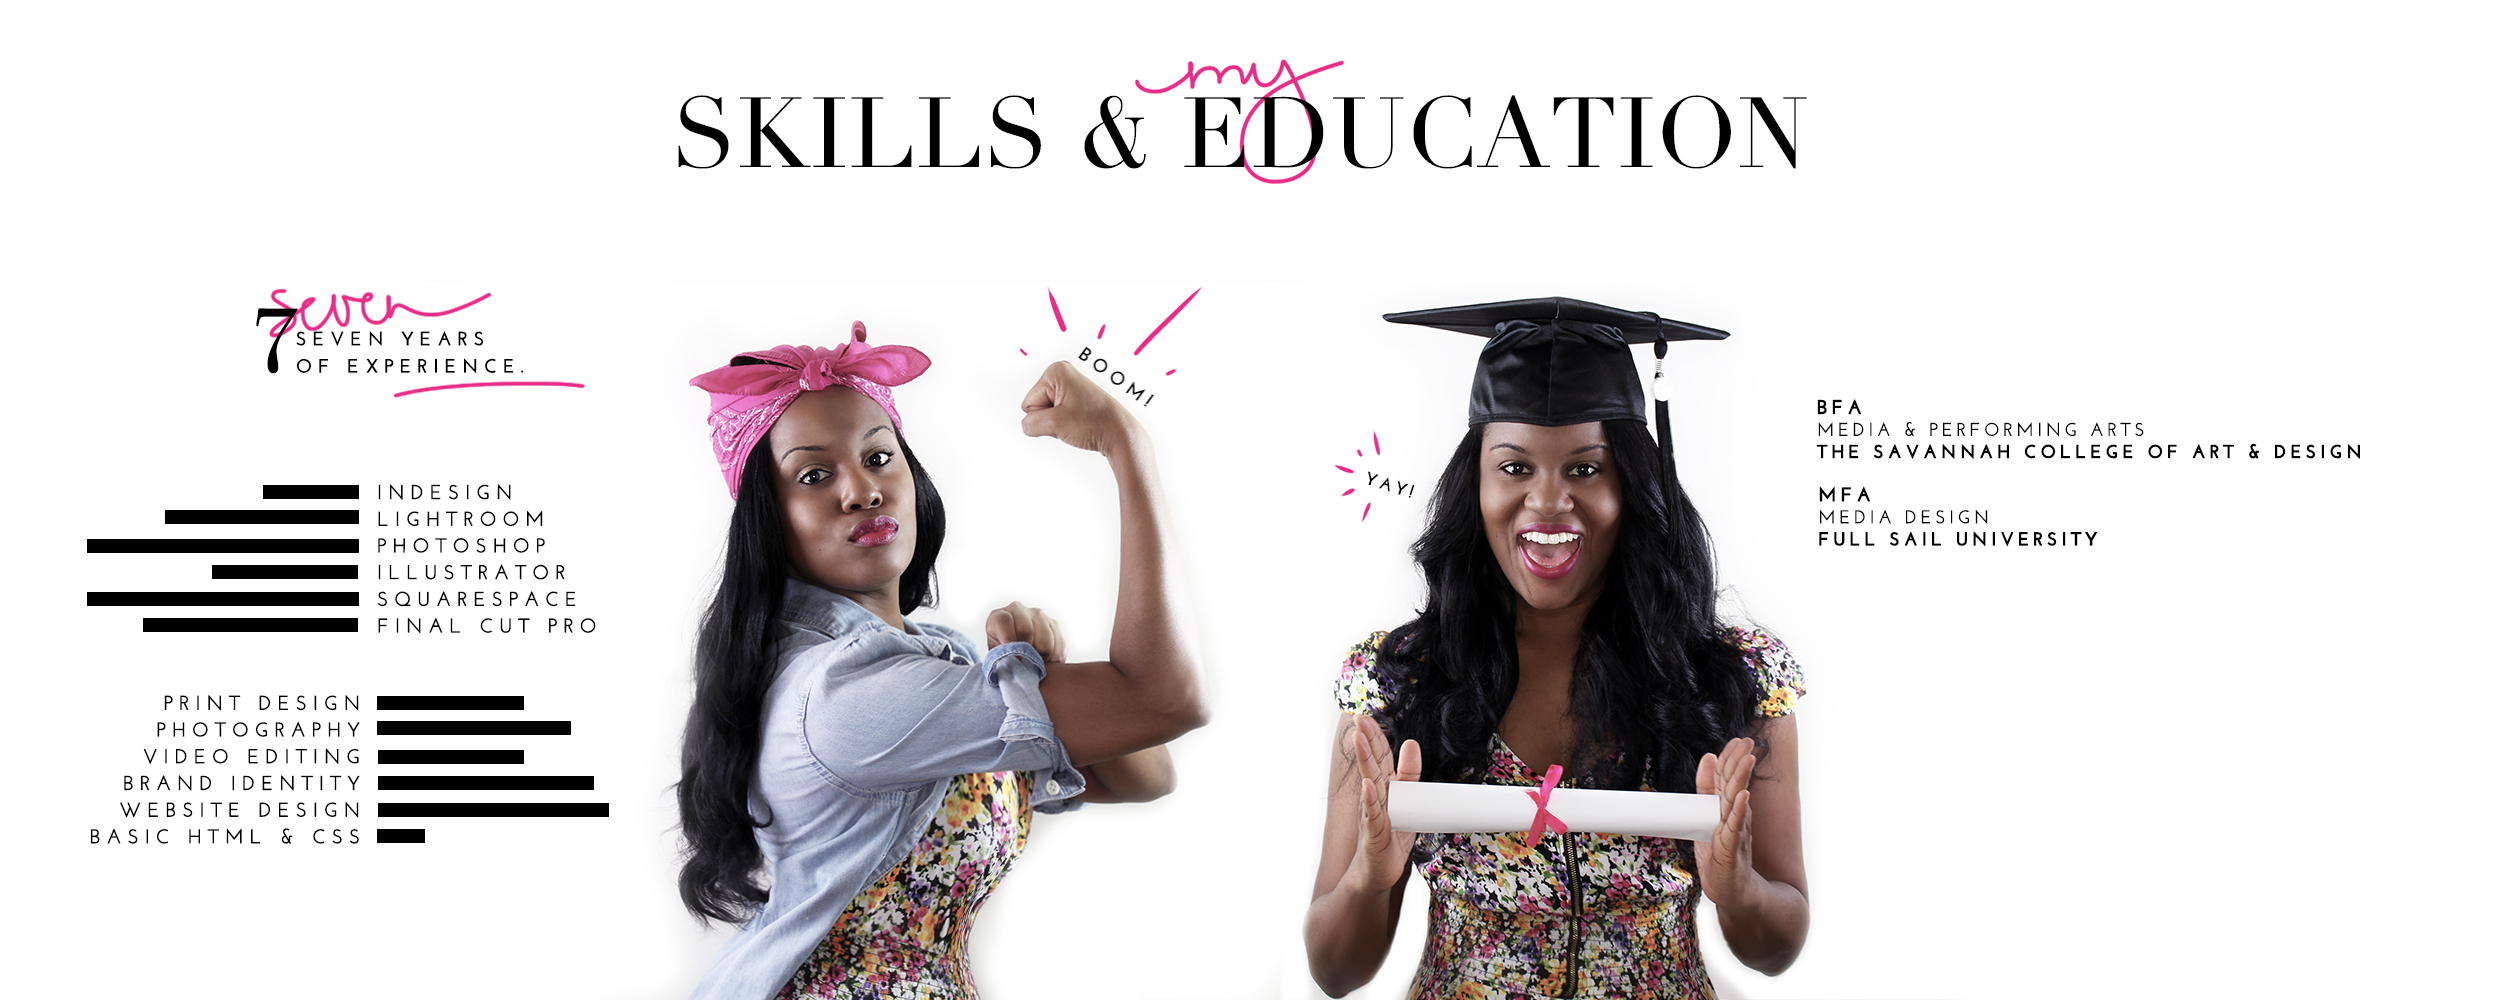 SkillsEducation.png